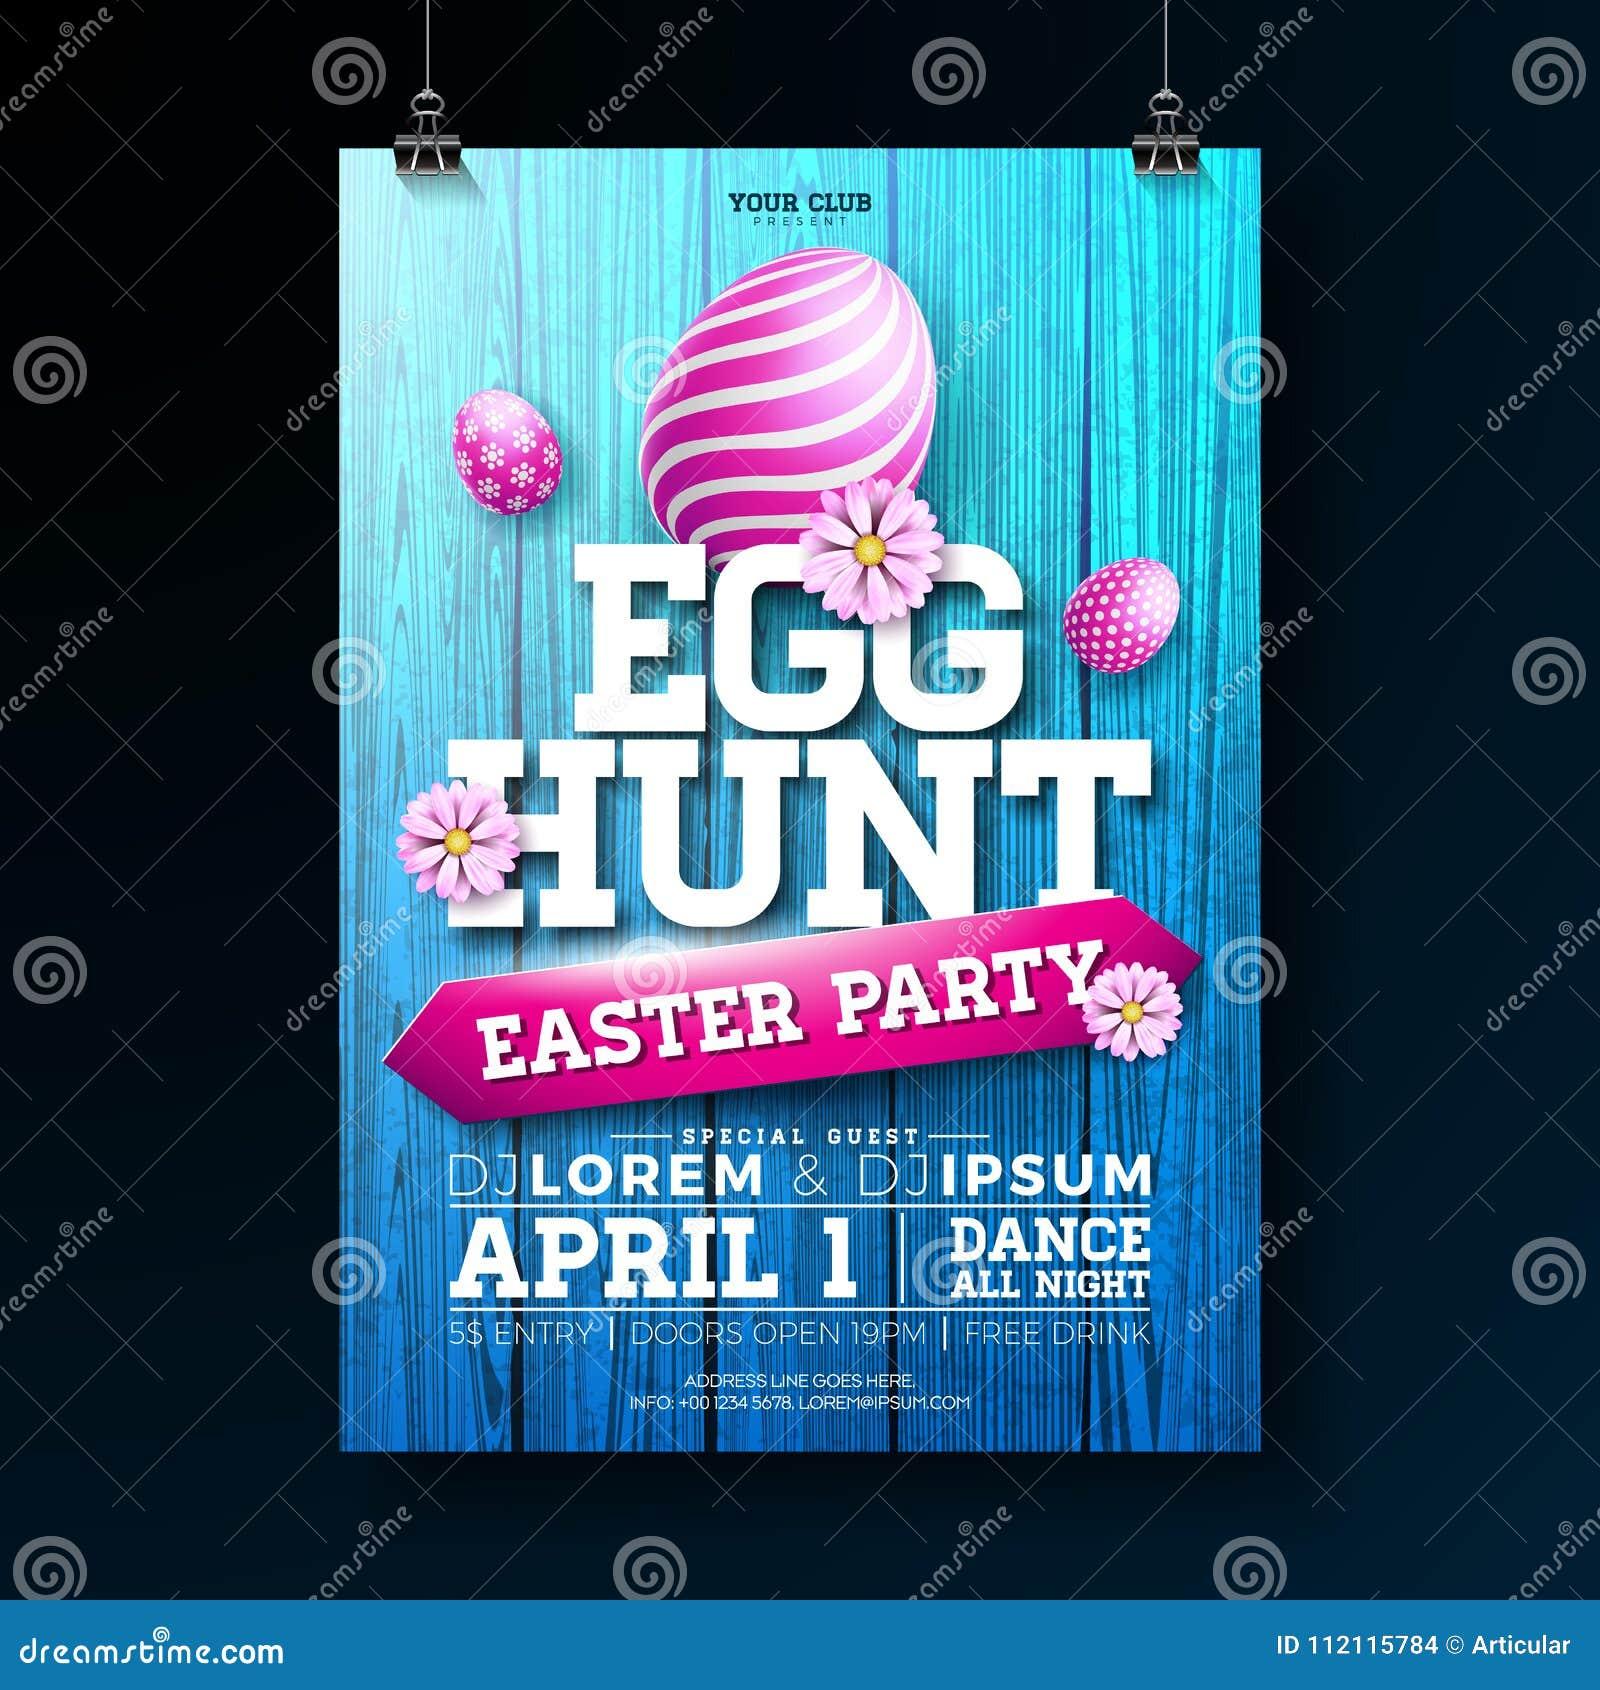 Vector o ovo Hunt Easter Party Flyer Illustration com ovos, as flores e elementos pintados da tipografia na madeira do vintage